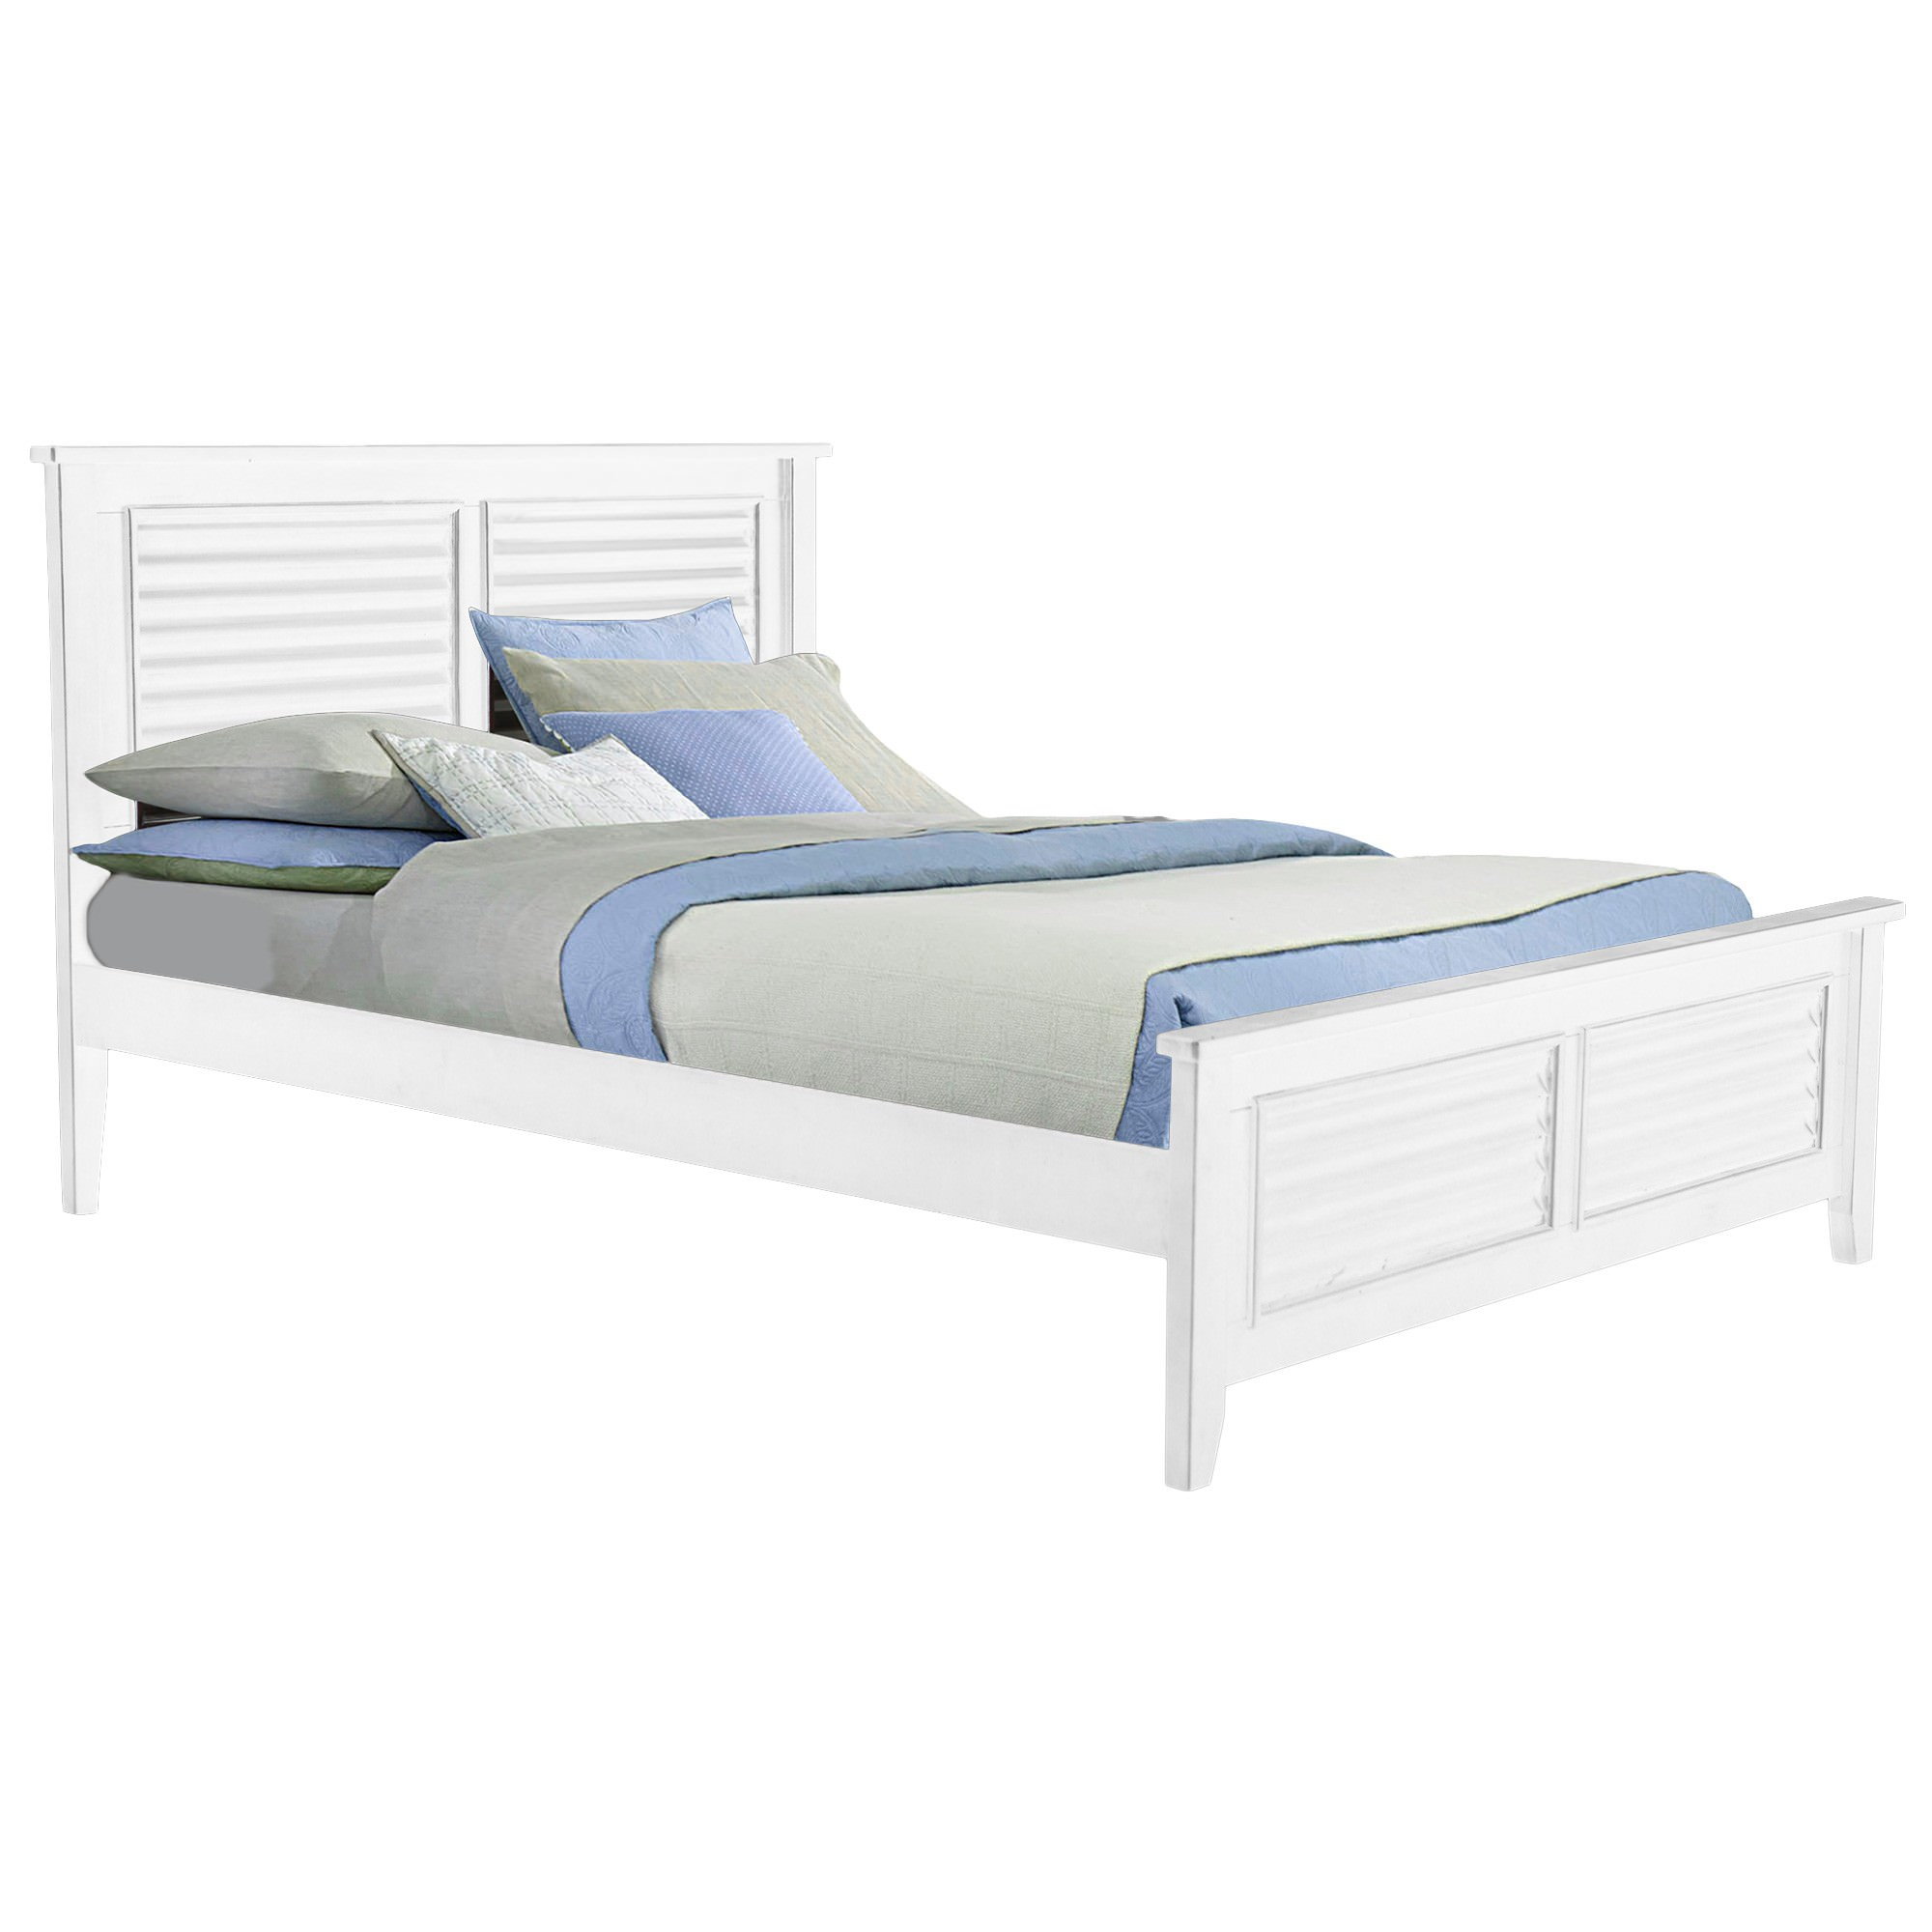 Venice Wooden Bed, Queen, White